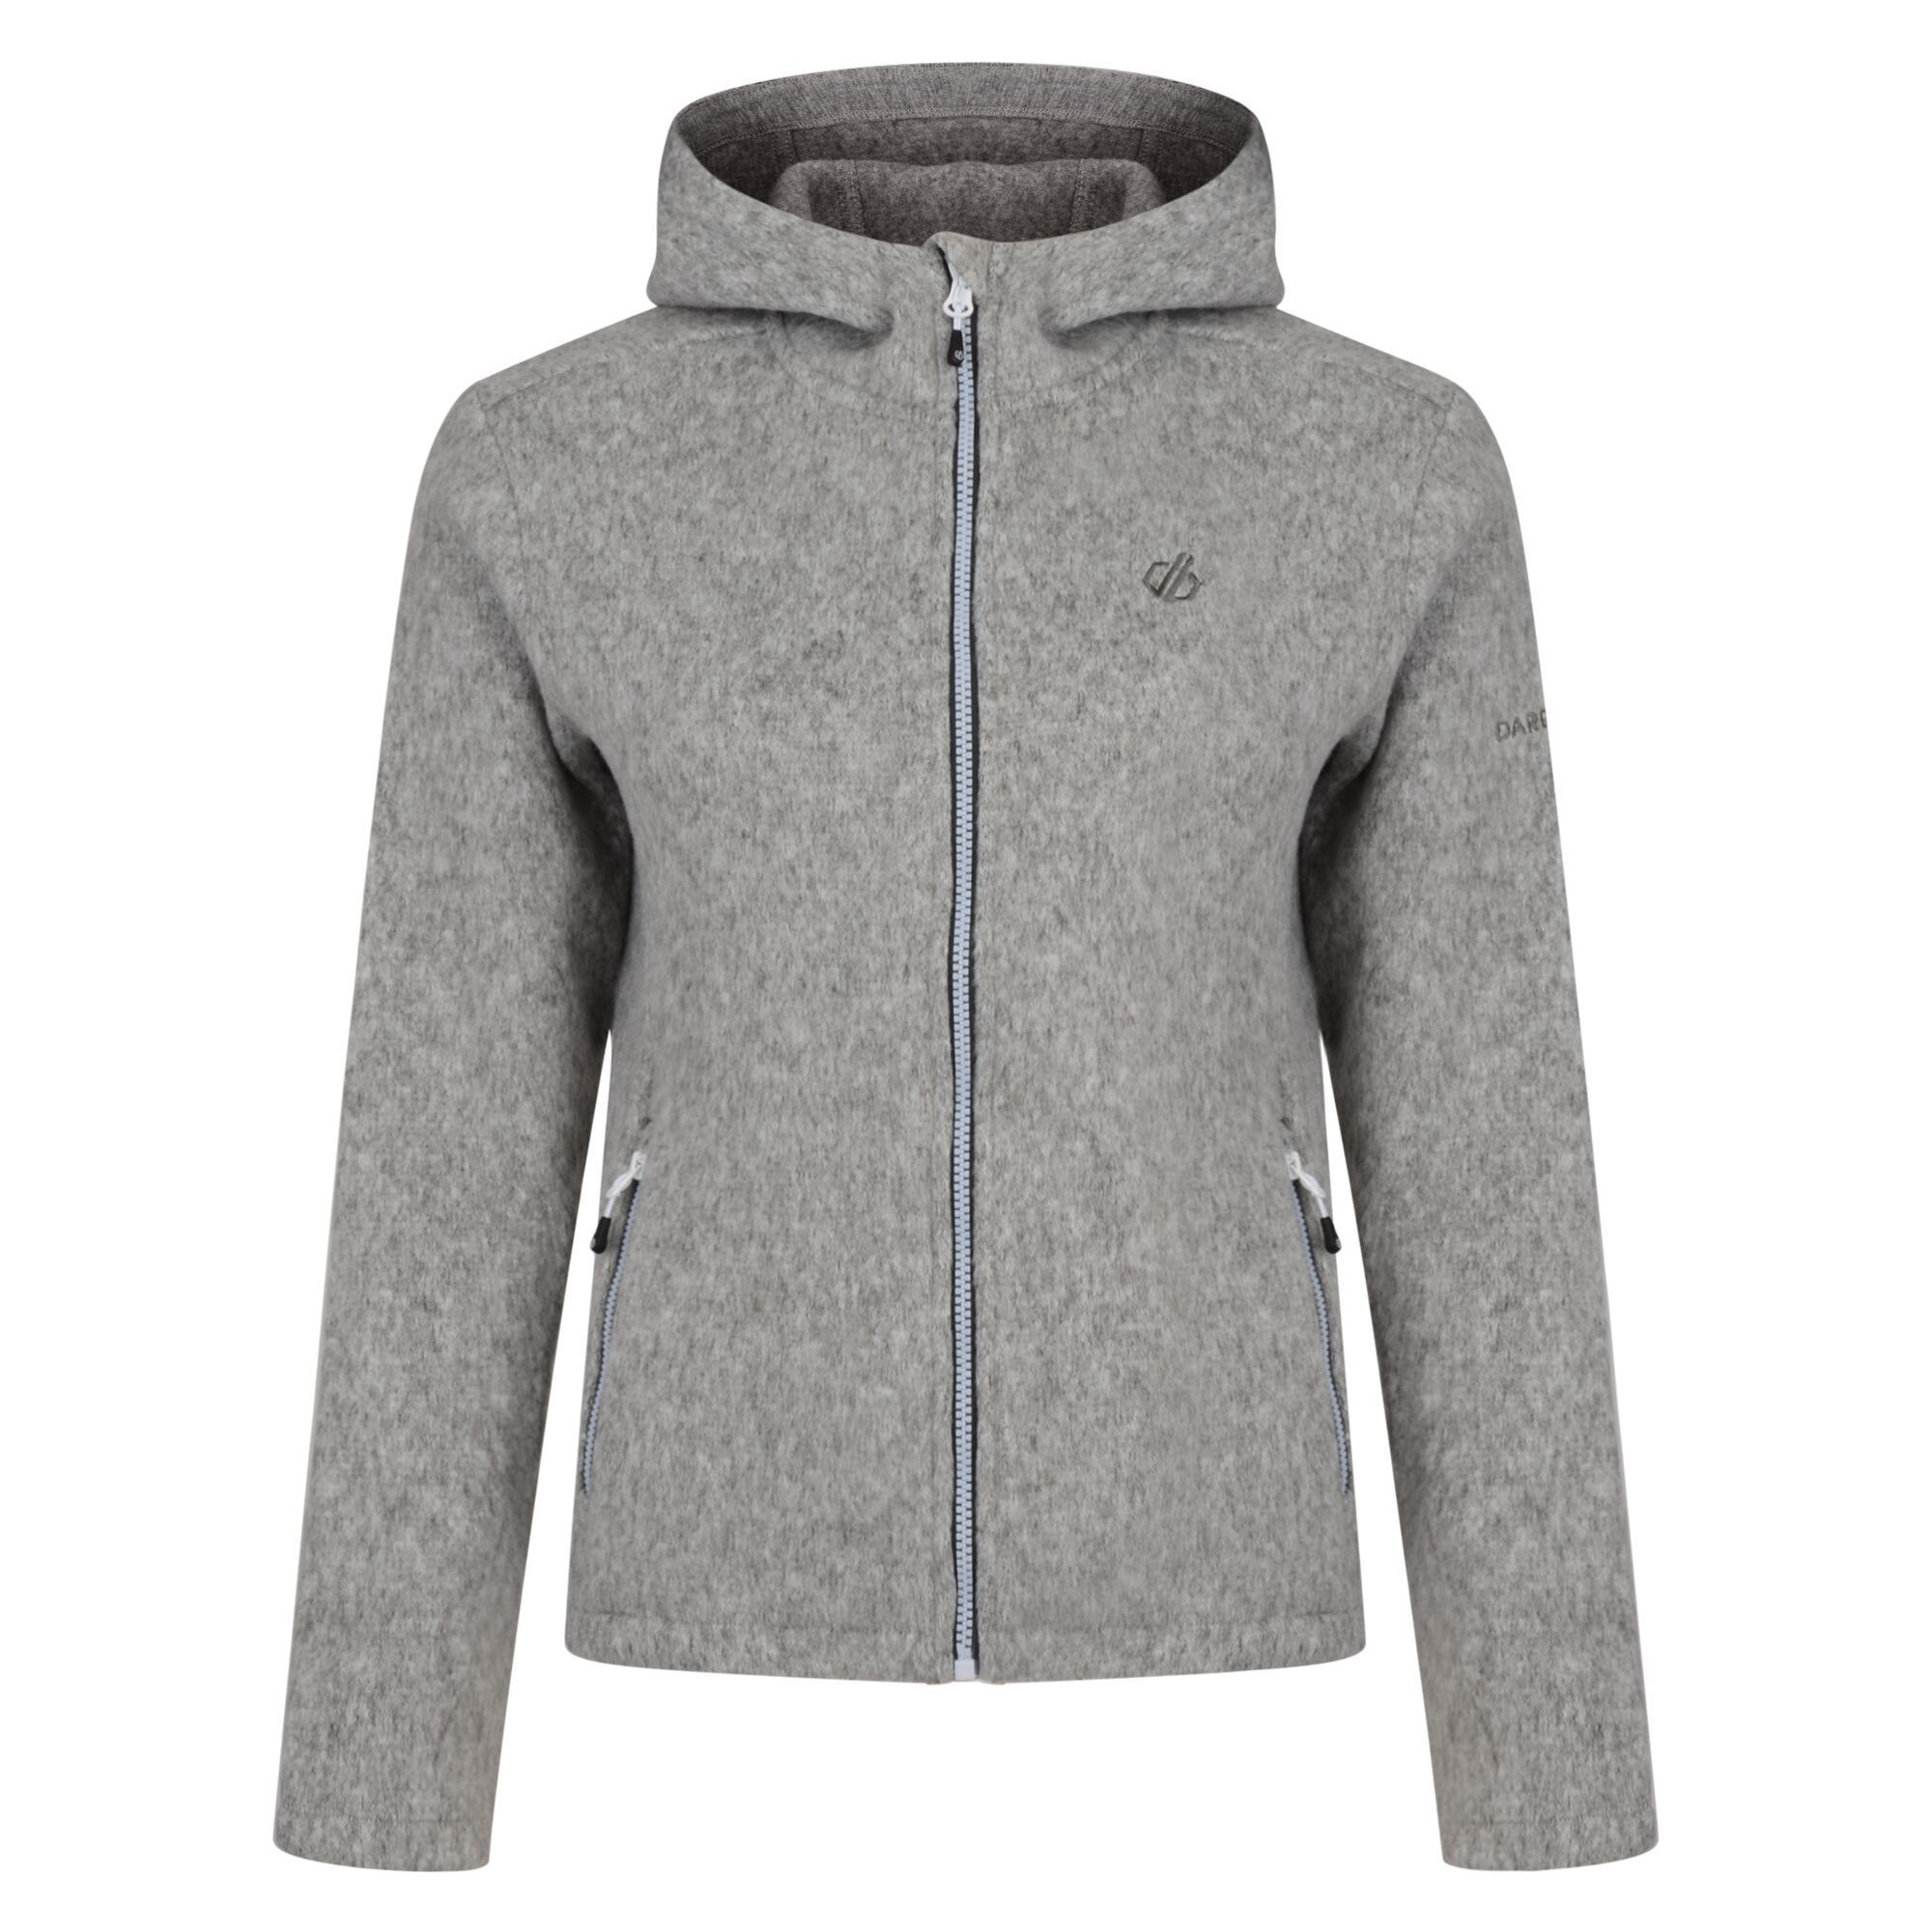 Dare 2B Womens/Ladies Forerun Full Zip Hooded Fleece Jacket